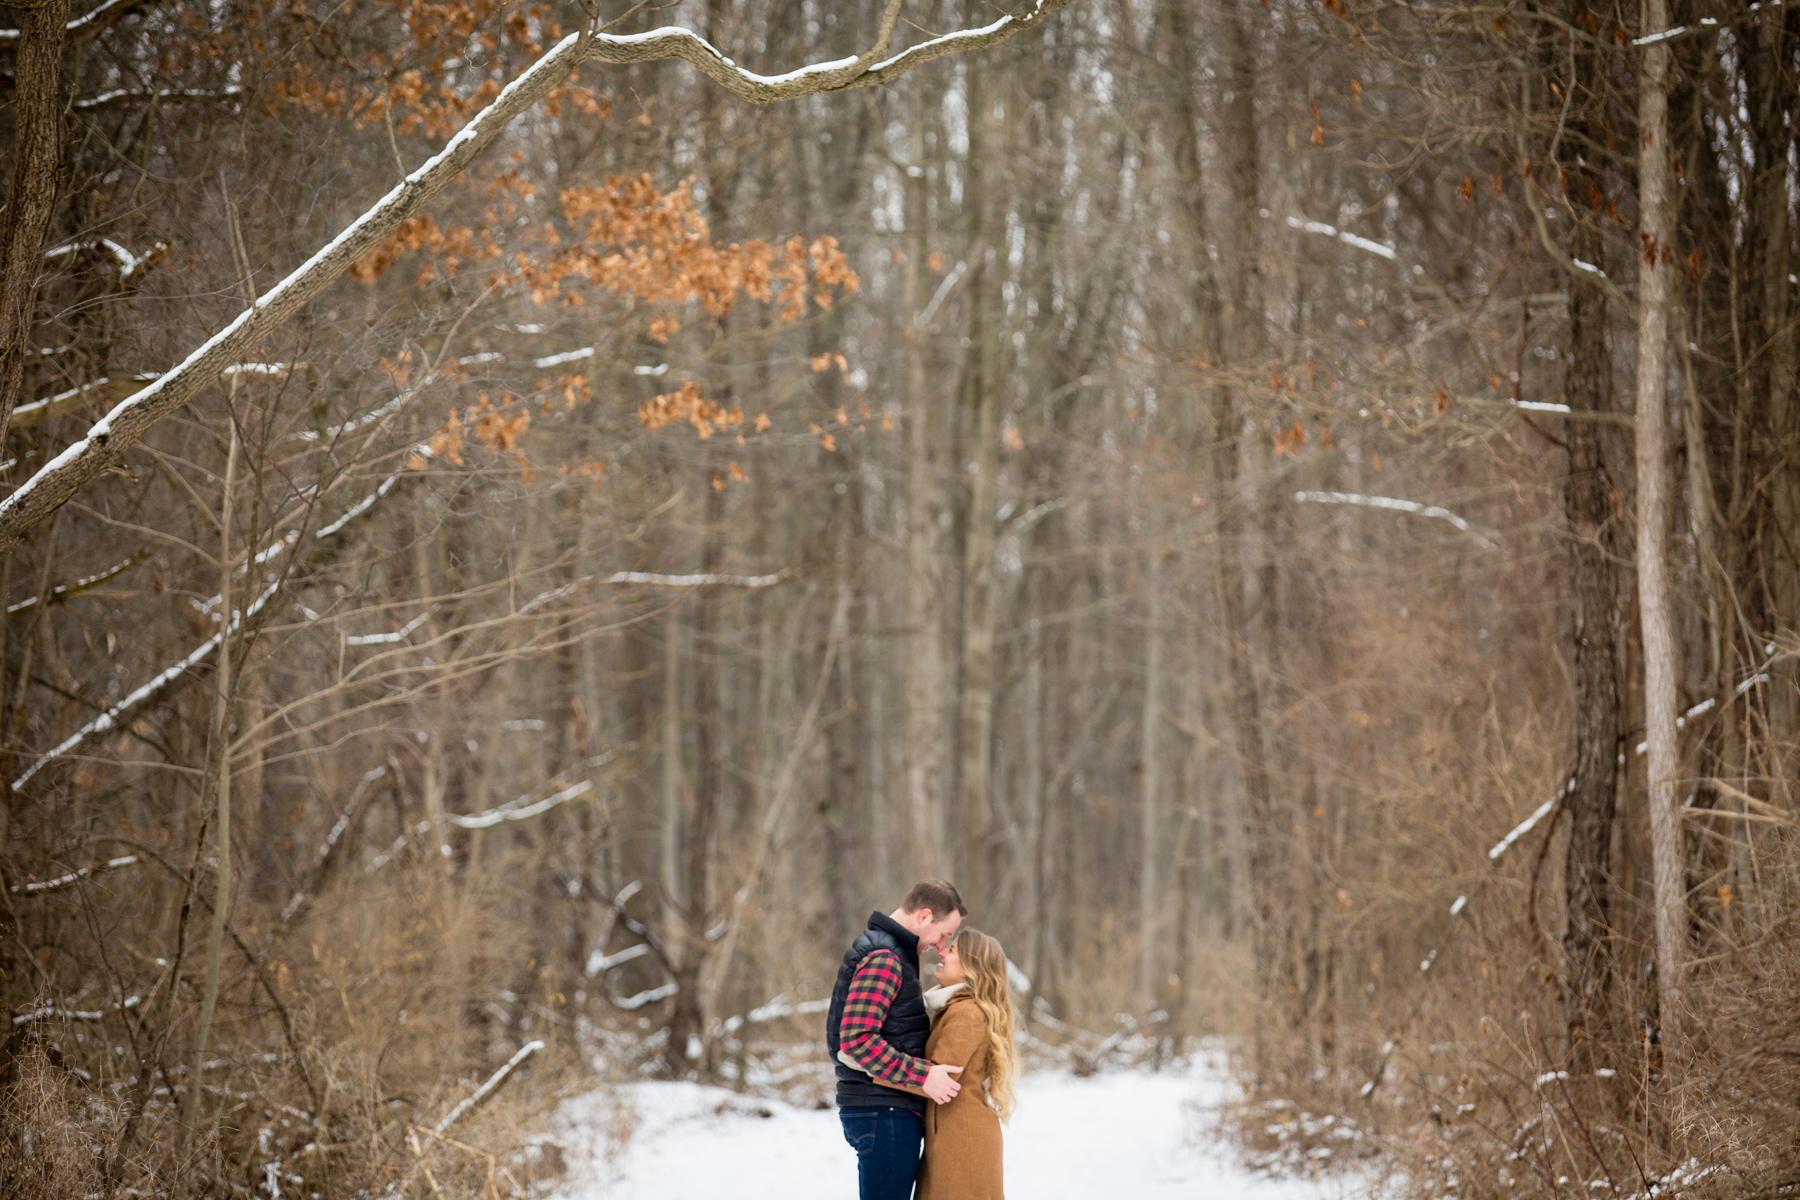 Doug&Kara_winter_Engagment_Photos_Brandon_Shafer_Photography_Blog-11.jpg